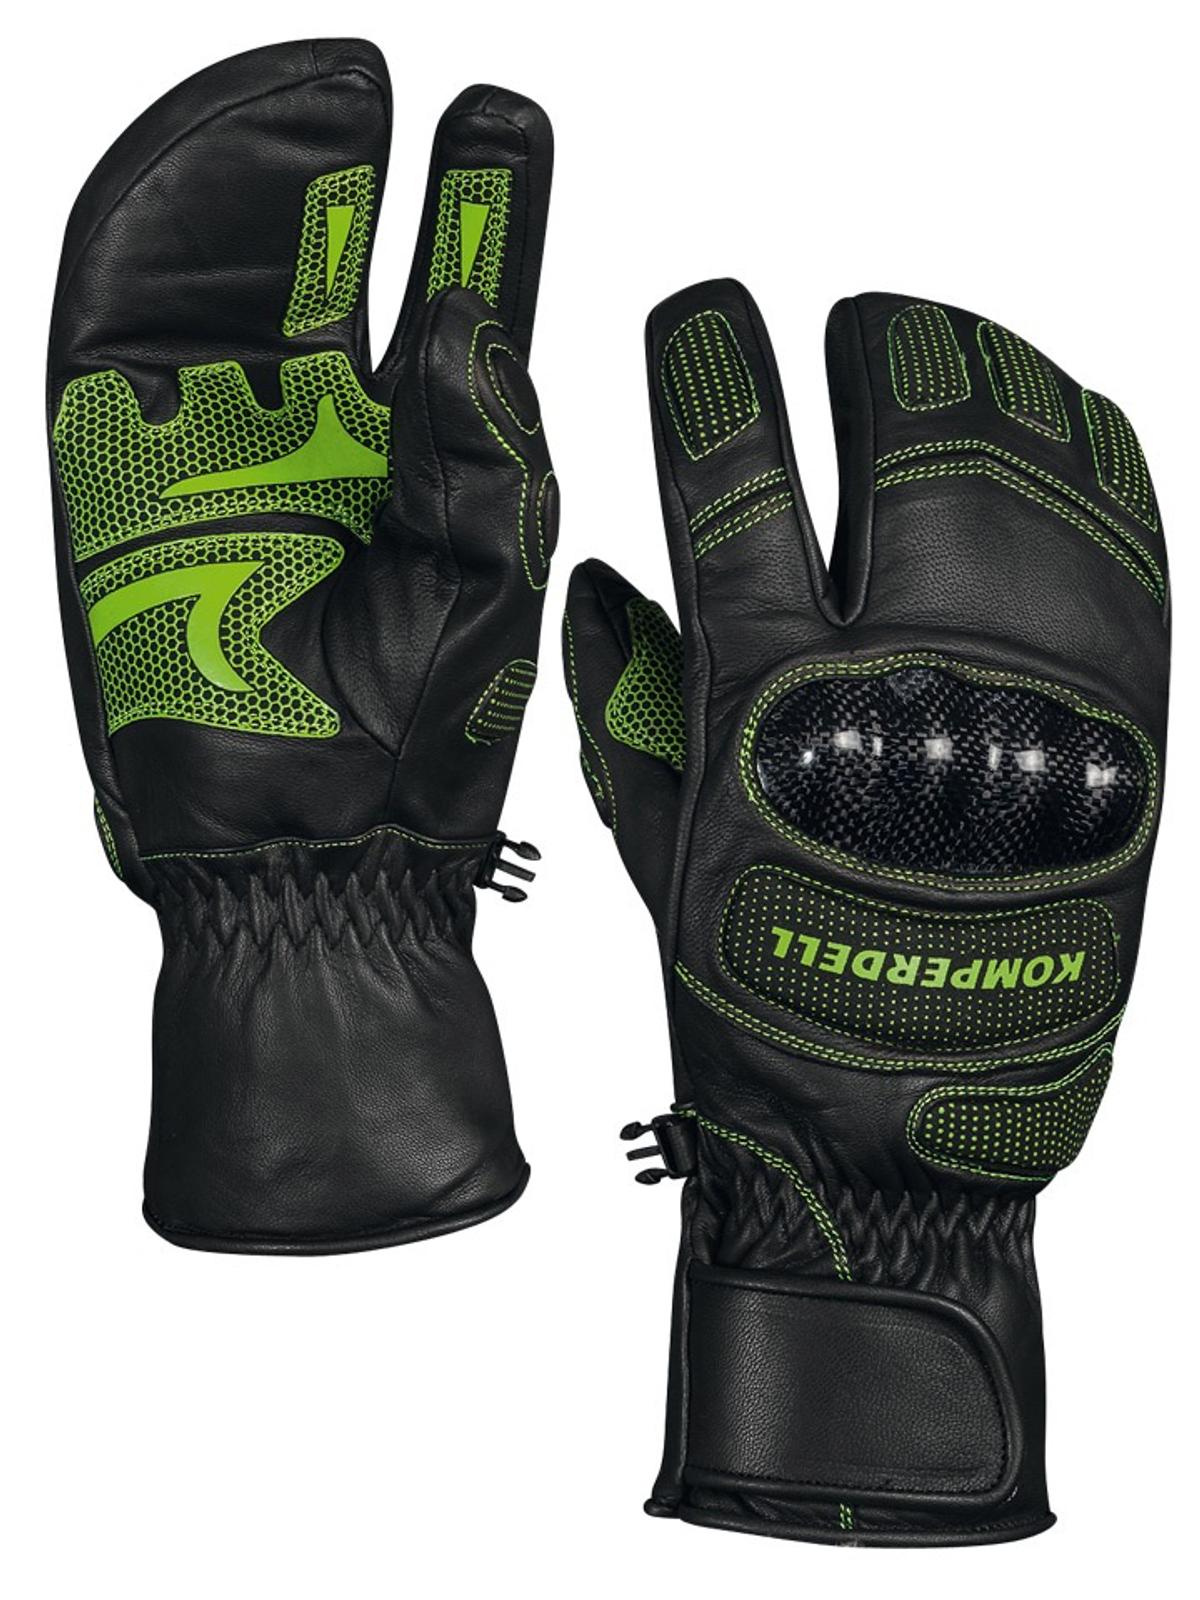 Komperdell NT Race Lobster Glove